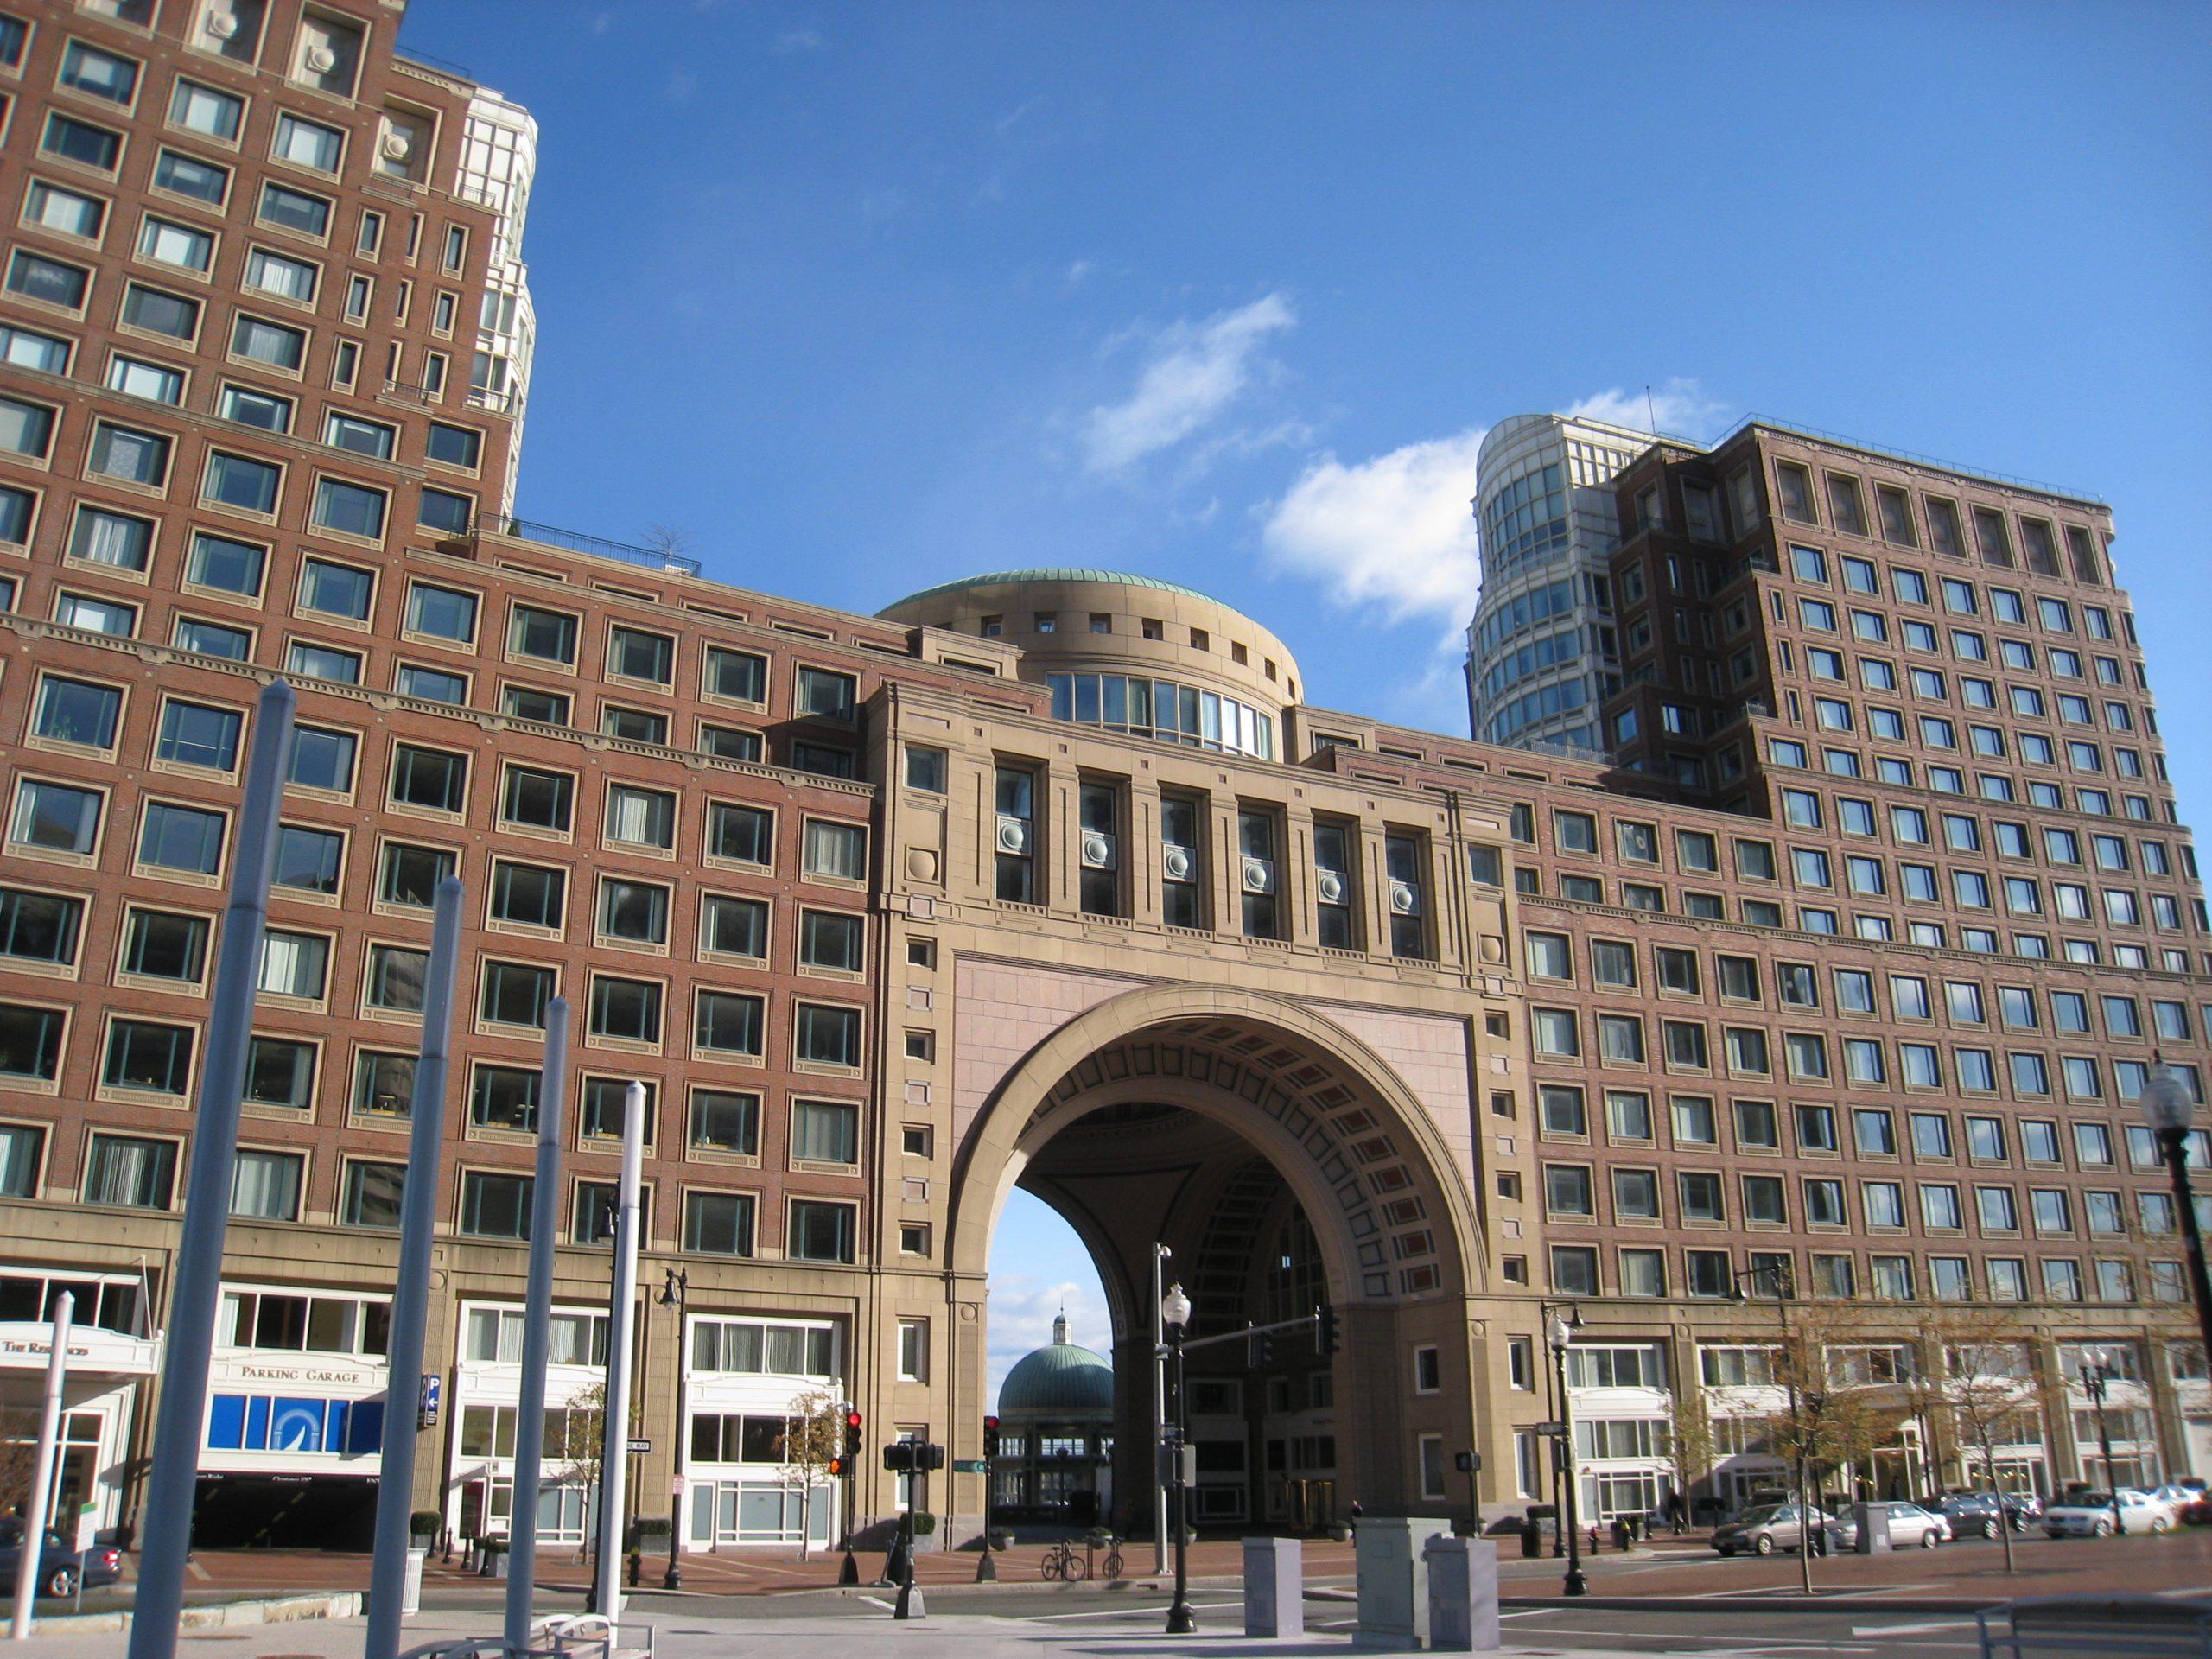 Rowes Wharf Boston, MA